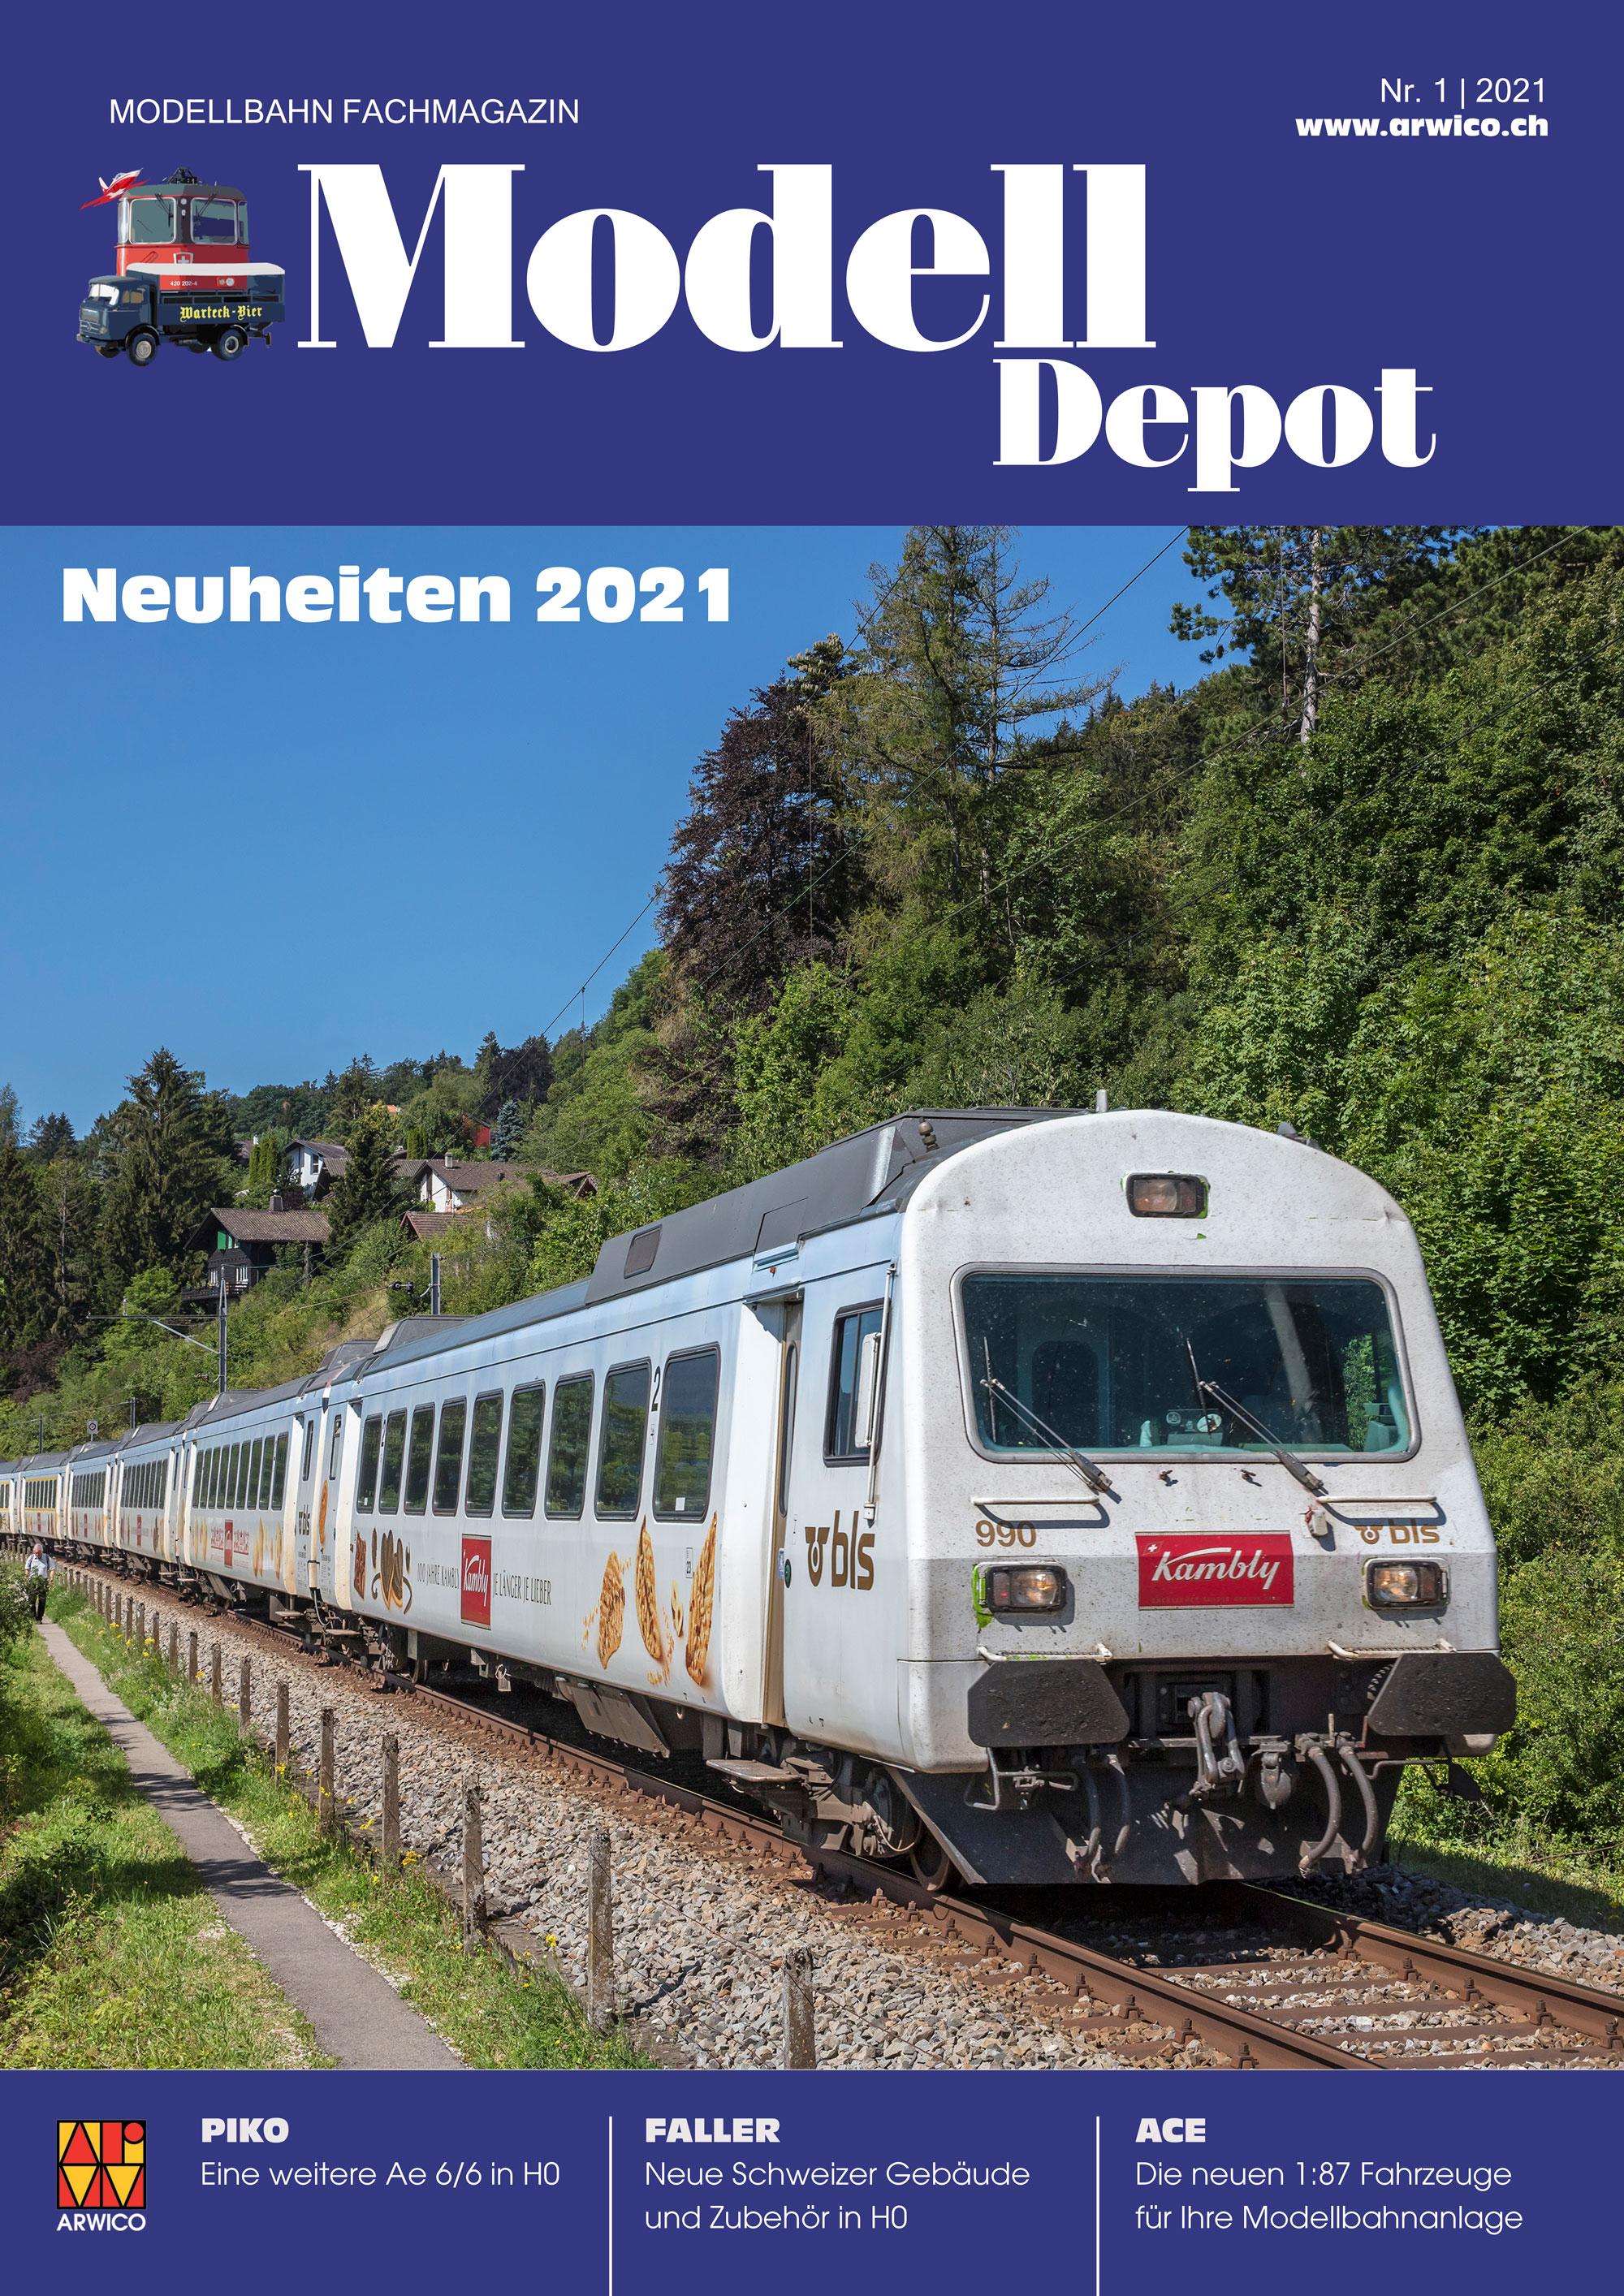 Arwico - Swiss novelties 2021